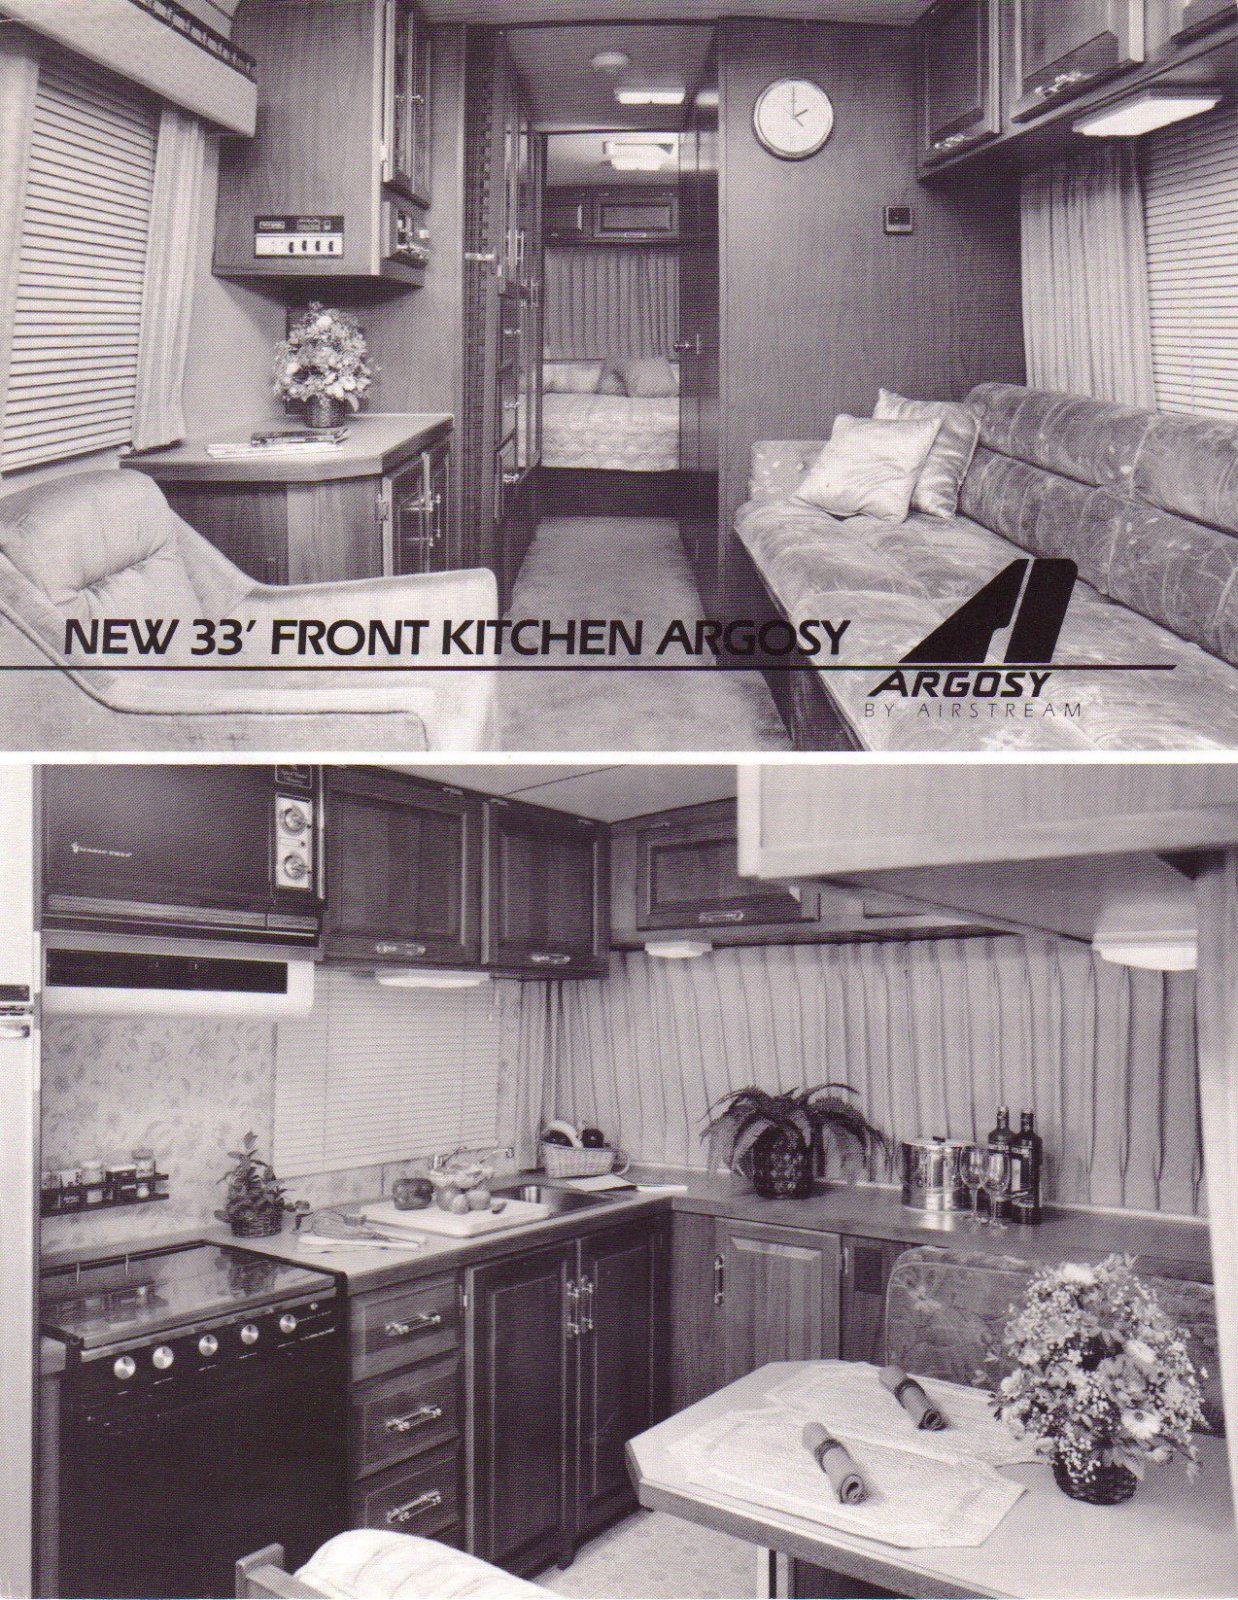 Click image for larger version  Name:1986 33ft frt kitchen Argosy.jpg Views:248 Size:574.9 KB ID:73039